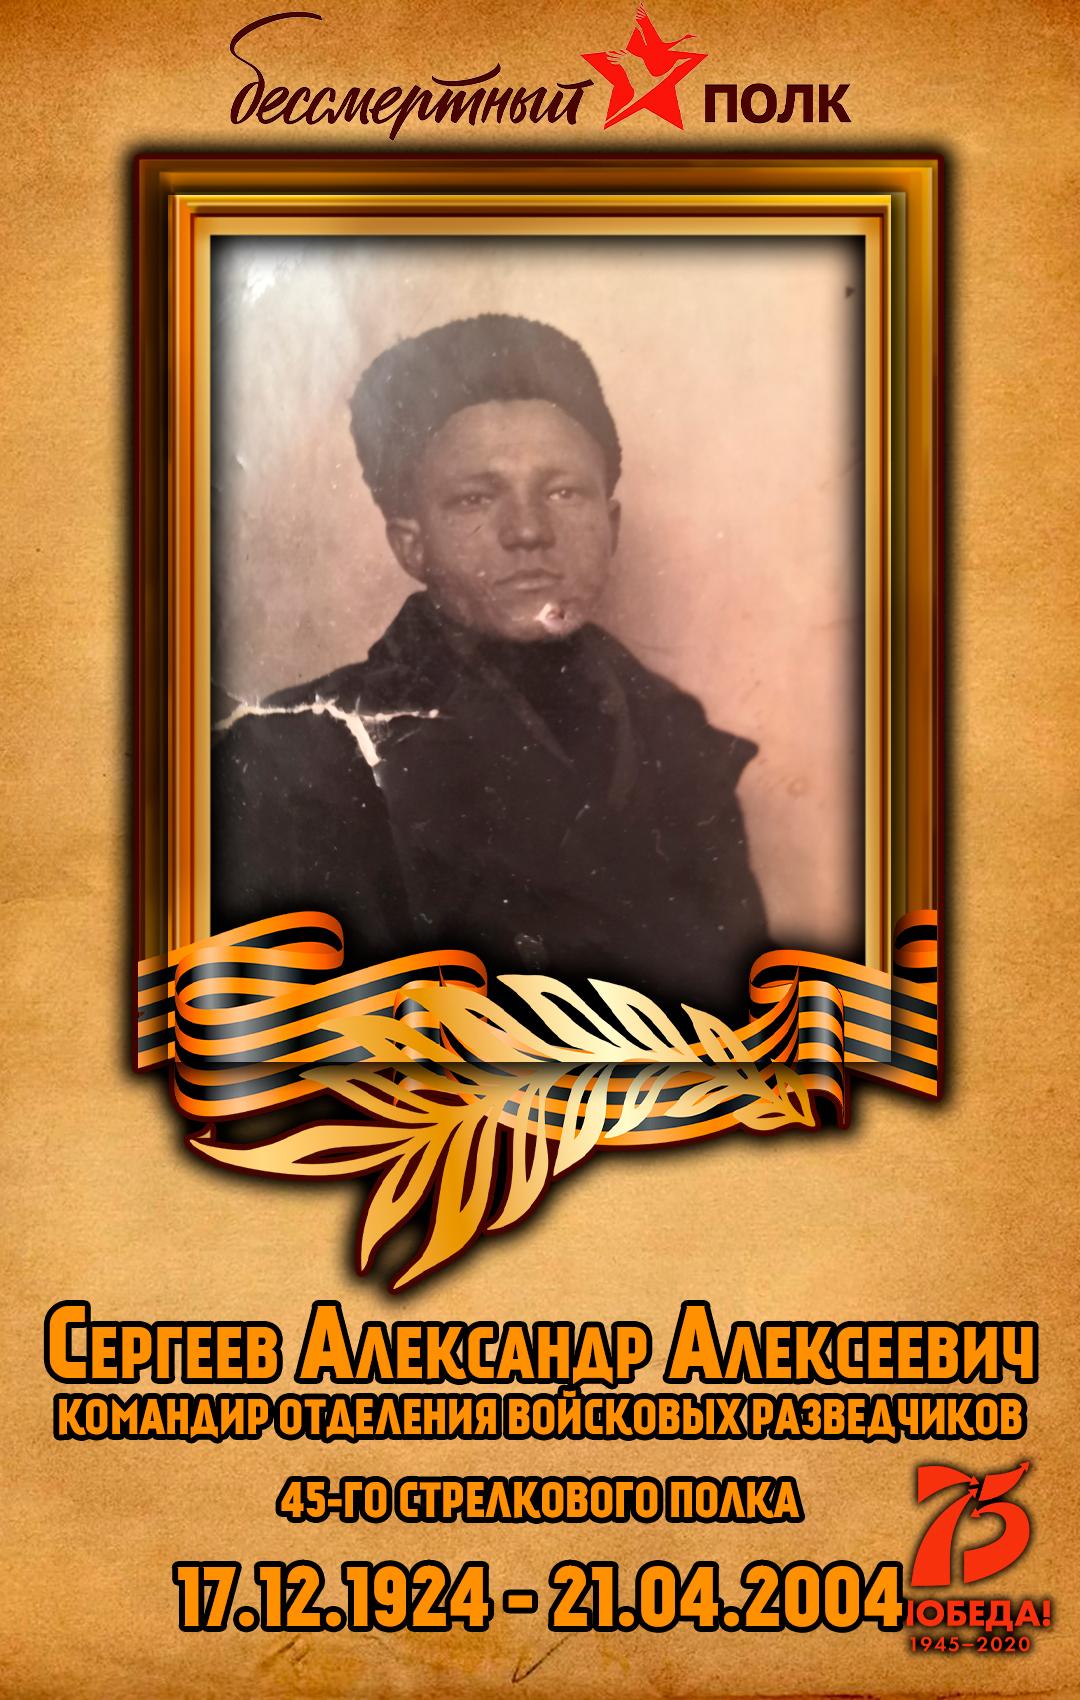 Сергеев-Александр-Алексеевич